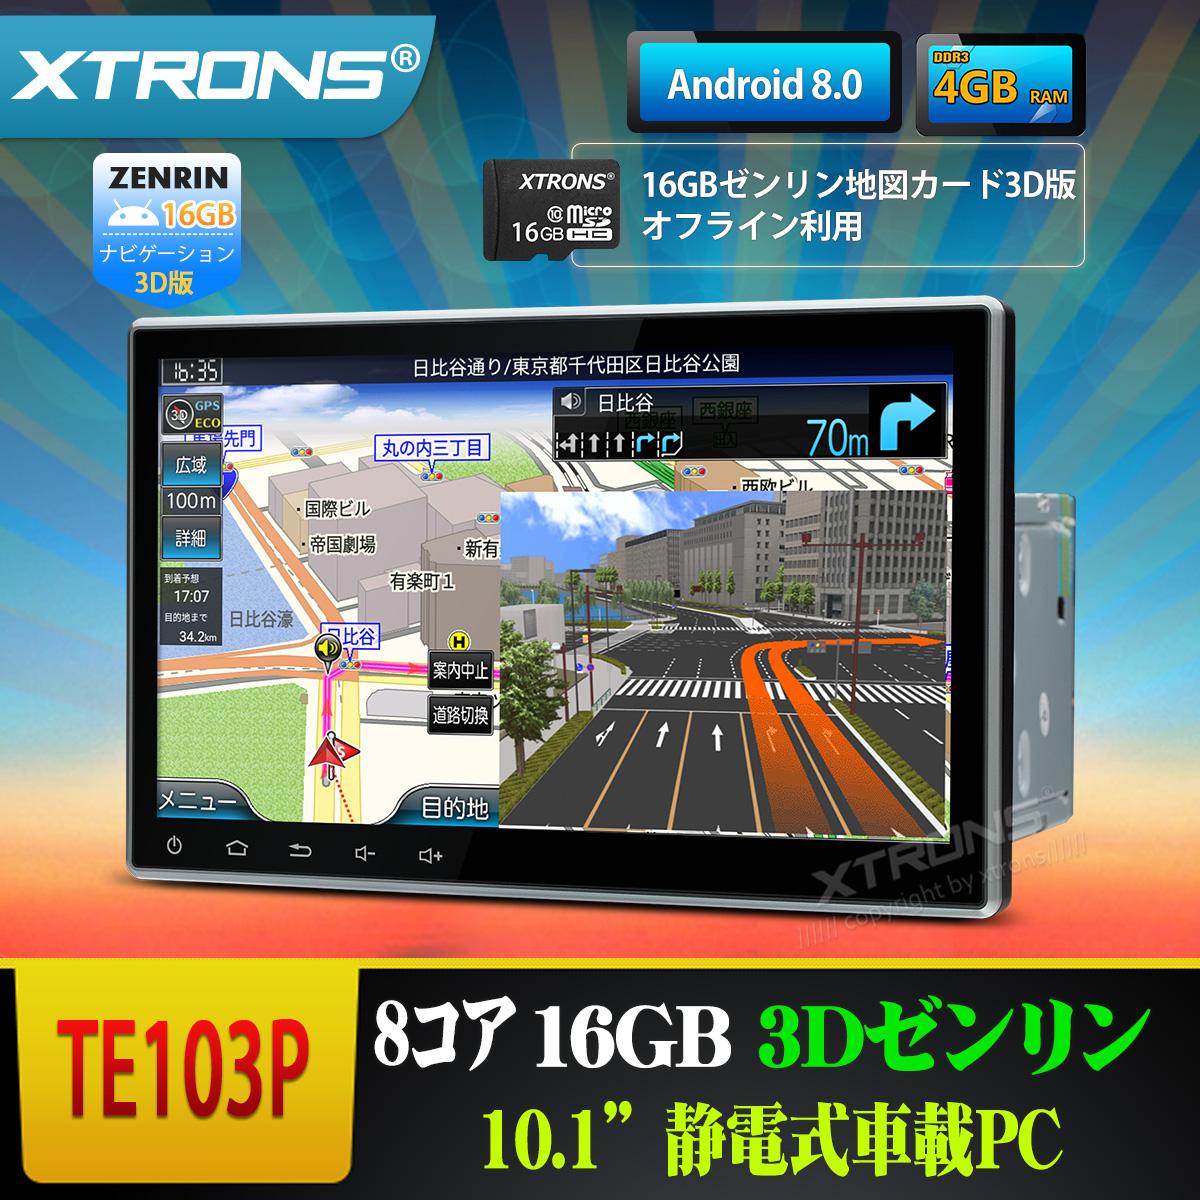 8コア OBD2 4G WIFI XTRONS 最新16GB地図付 (TE103AP) ROM32GB+RAM4GB